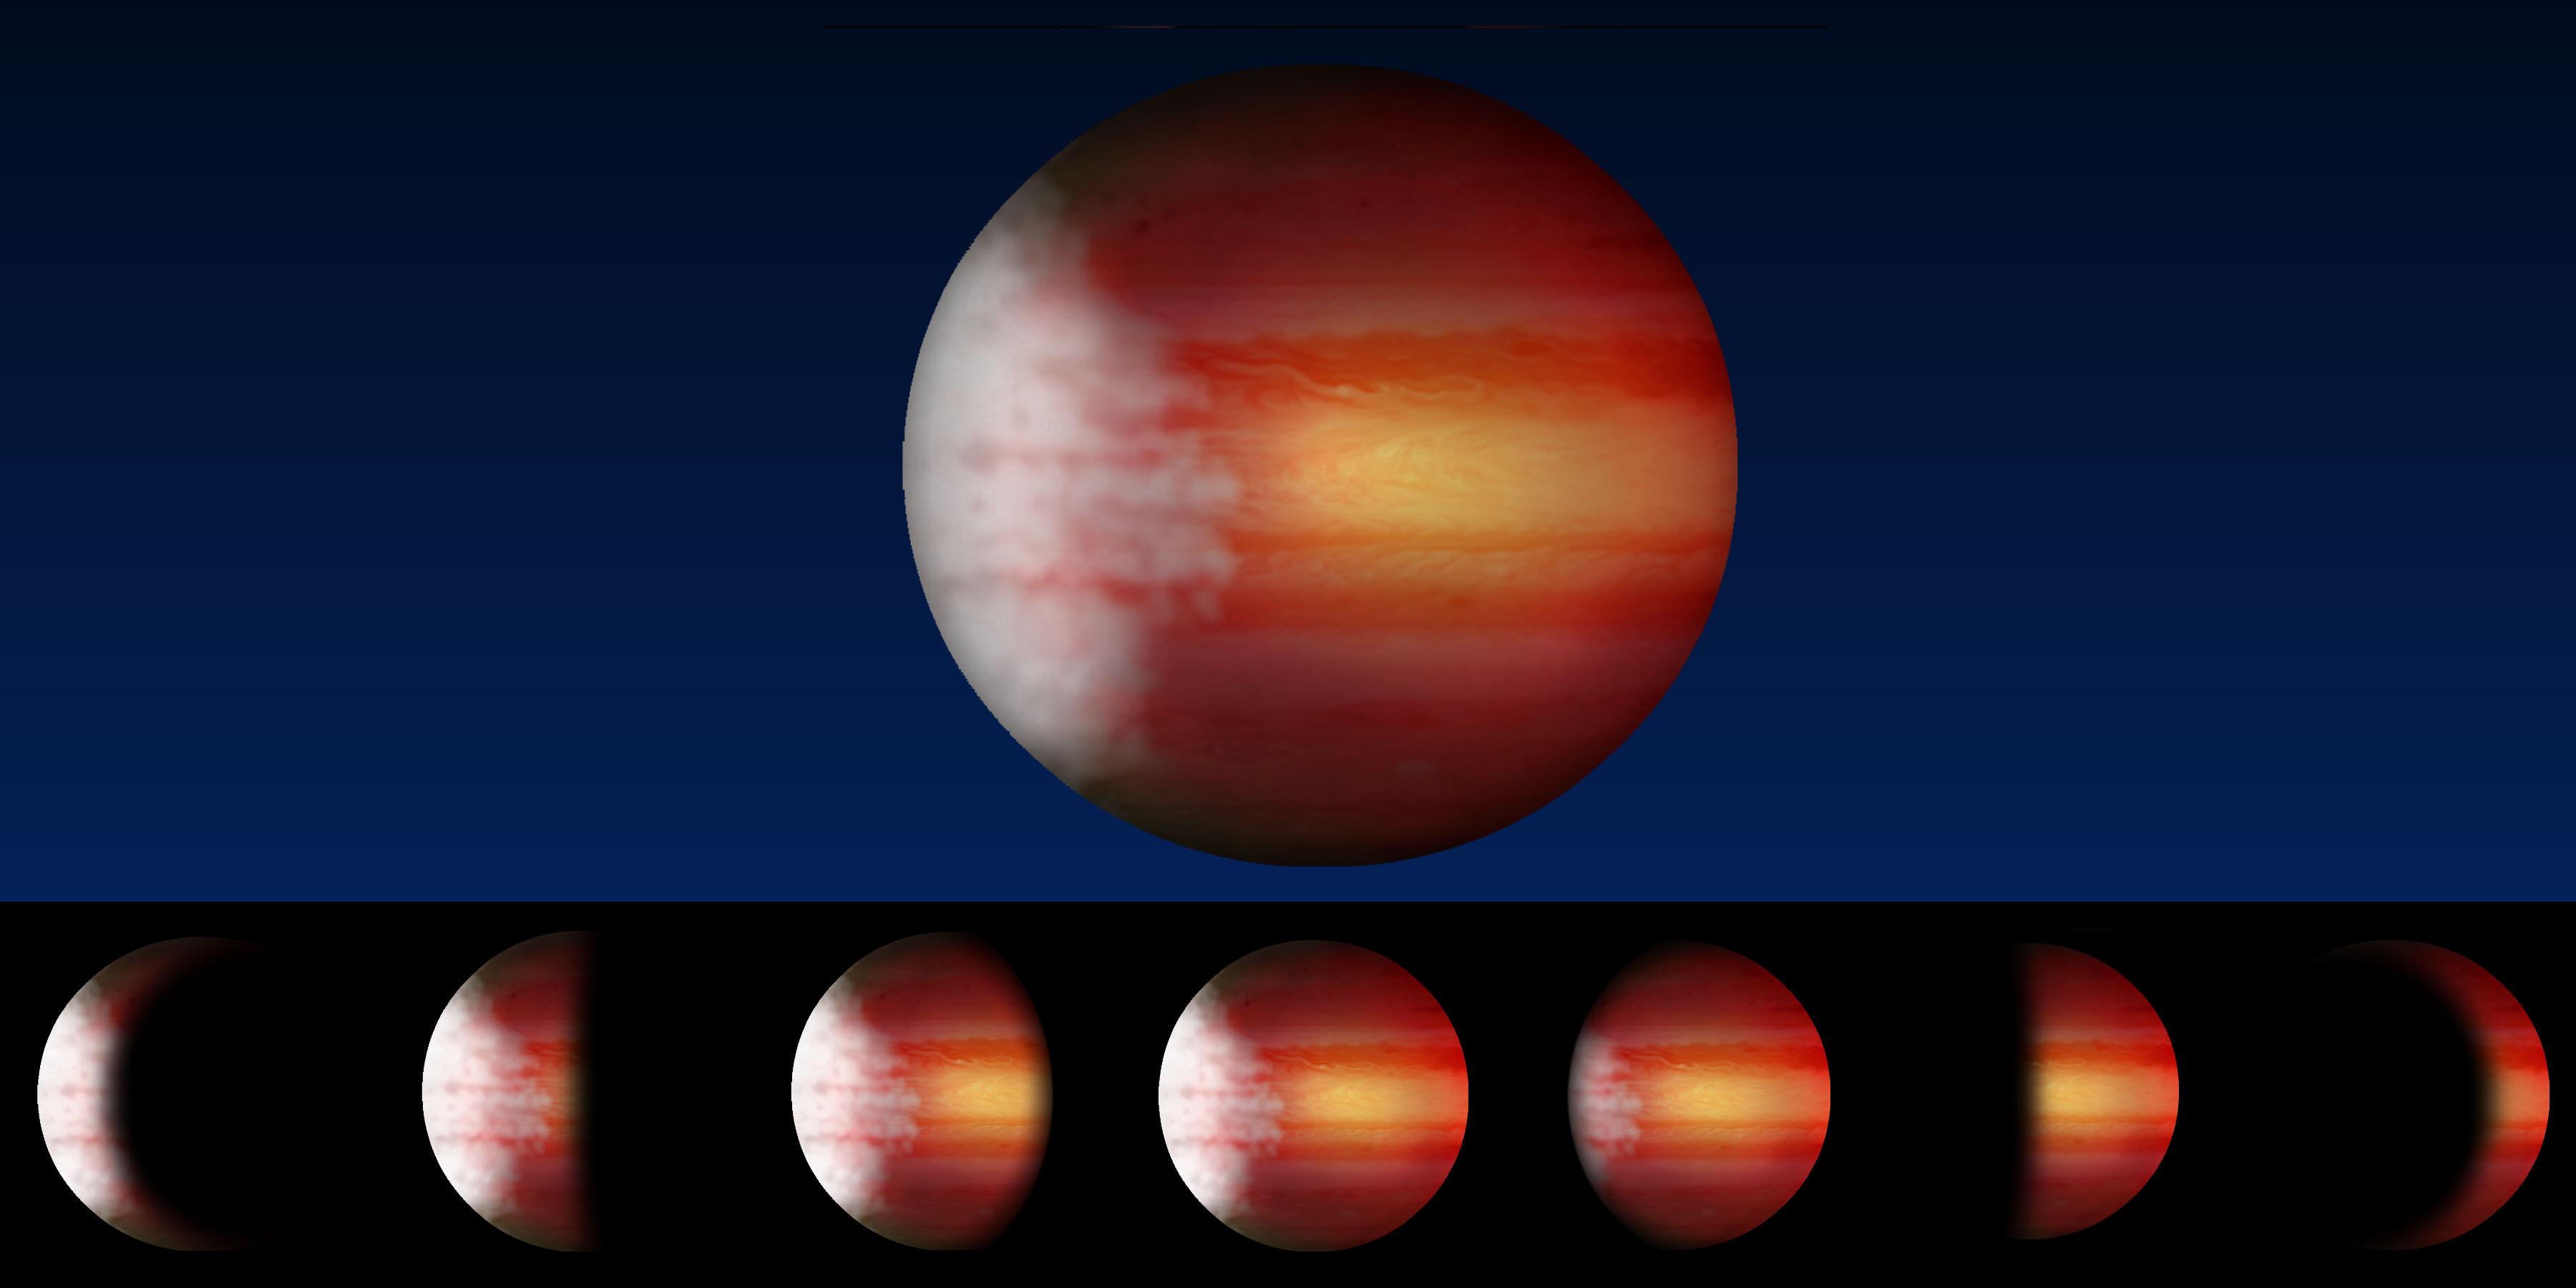 keplerplanets